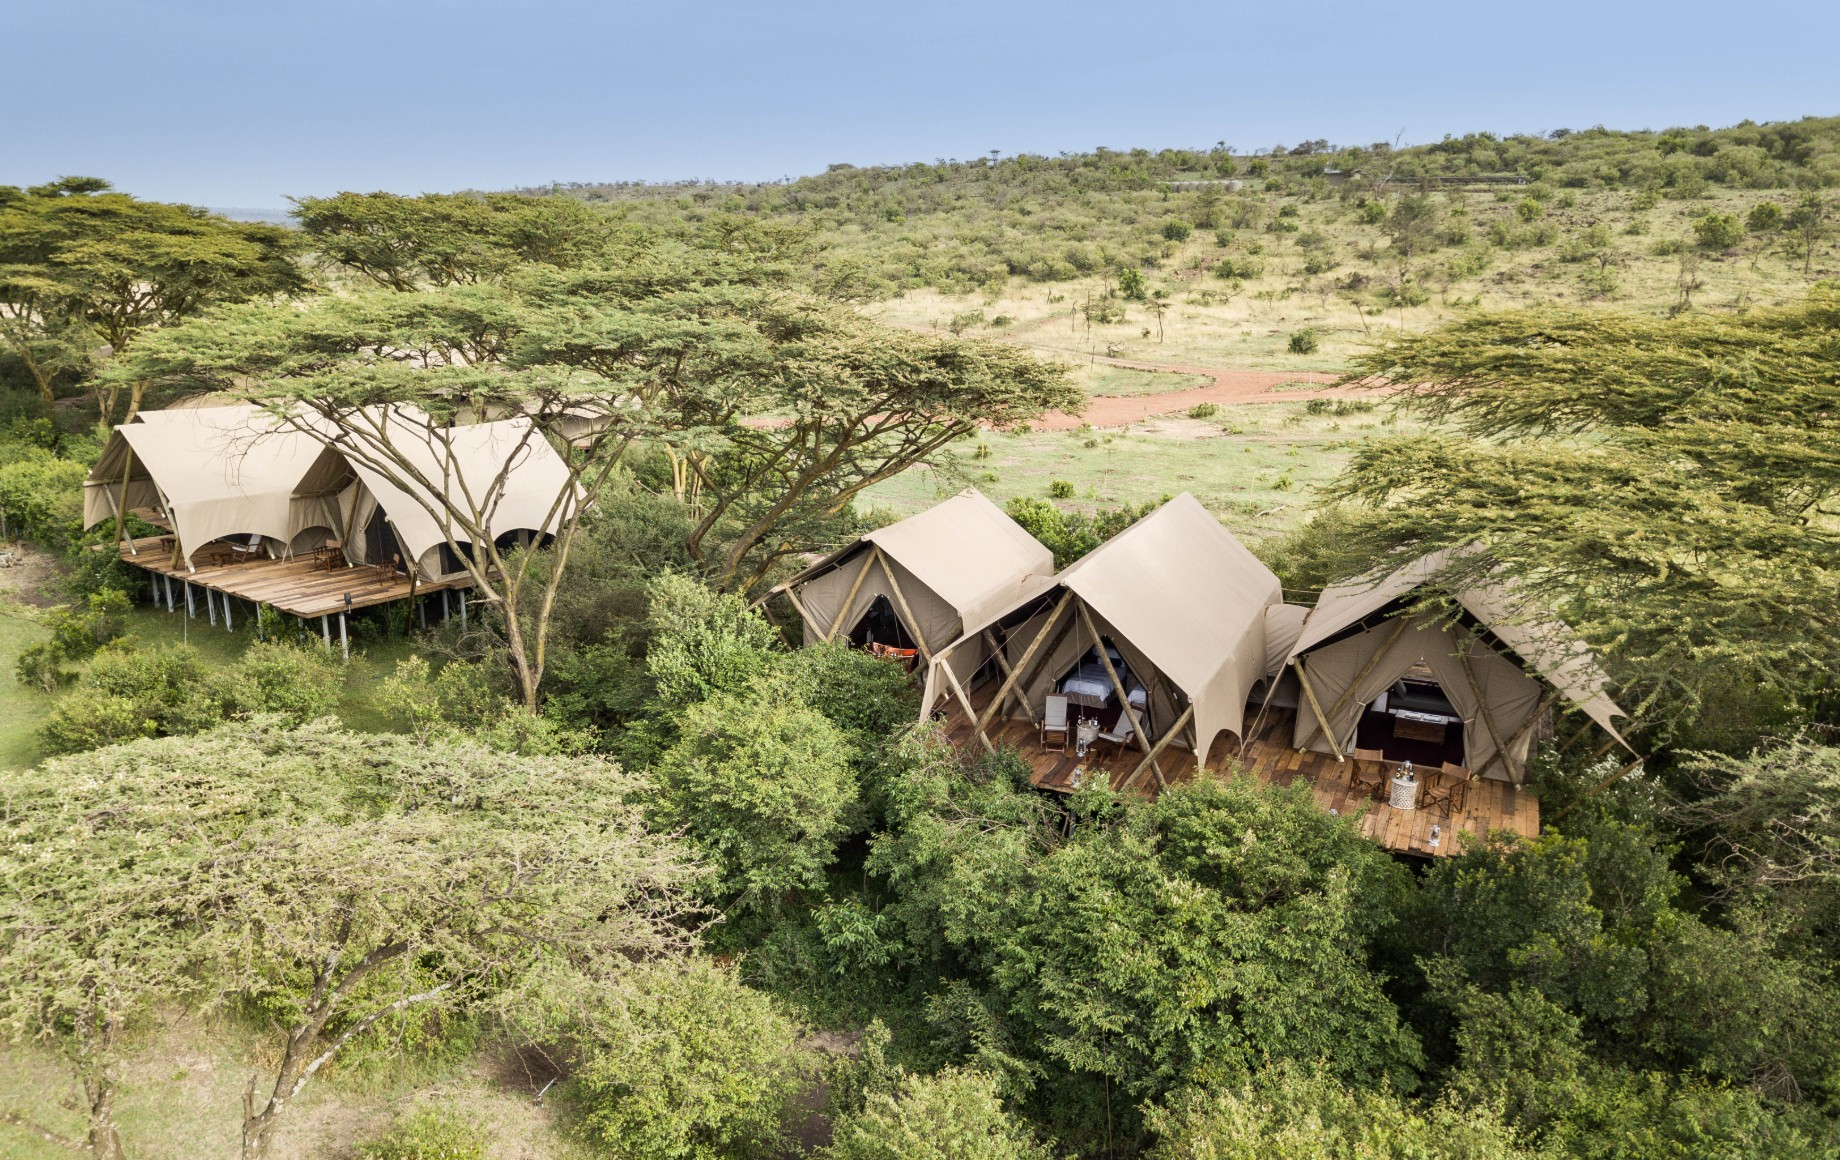 another angle of a row of tents at Mara Nyika